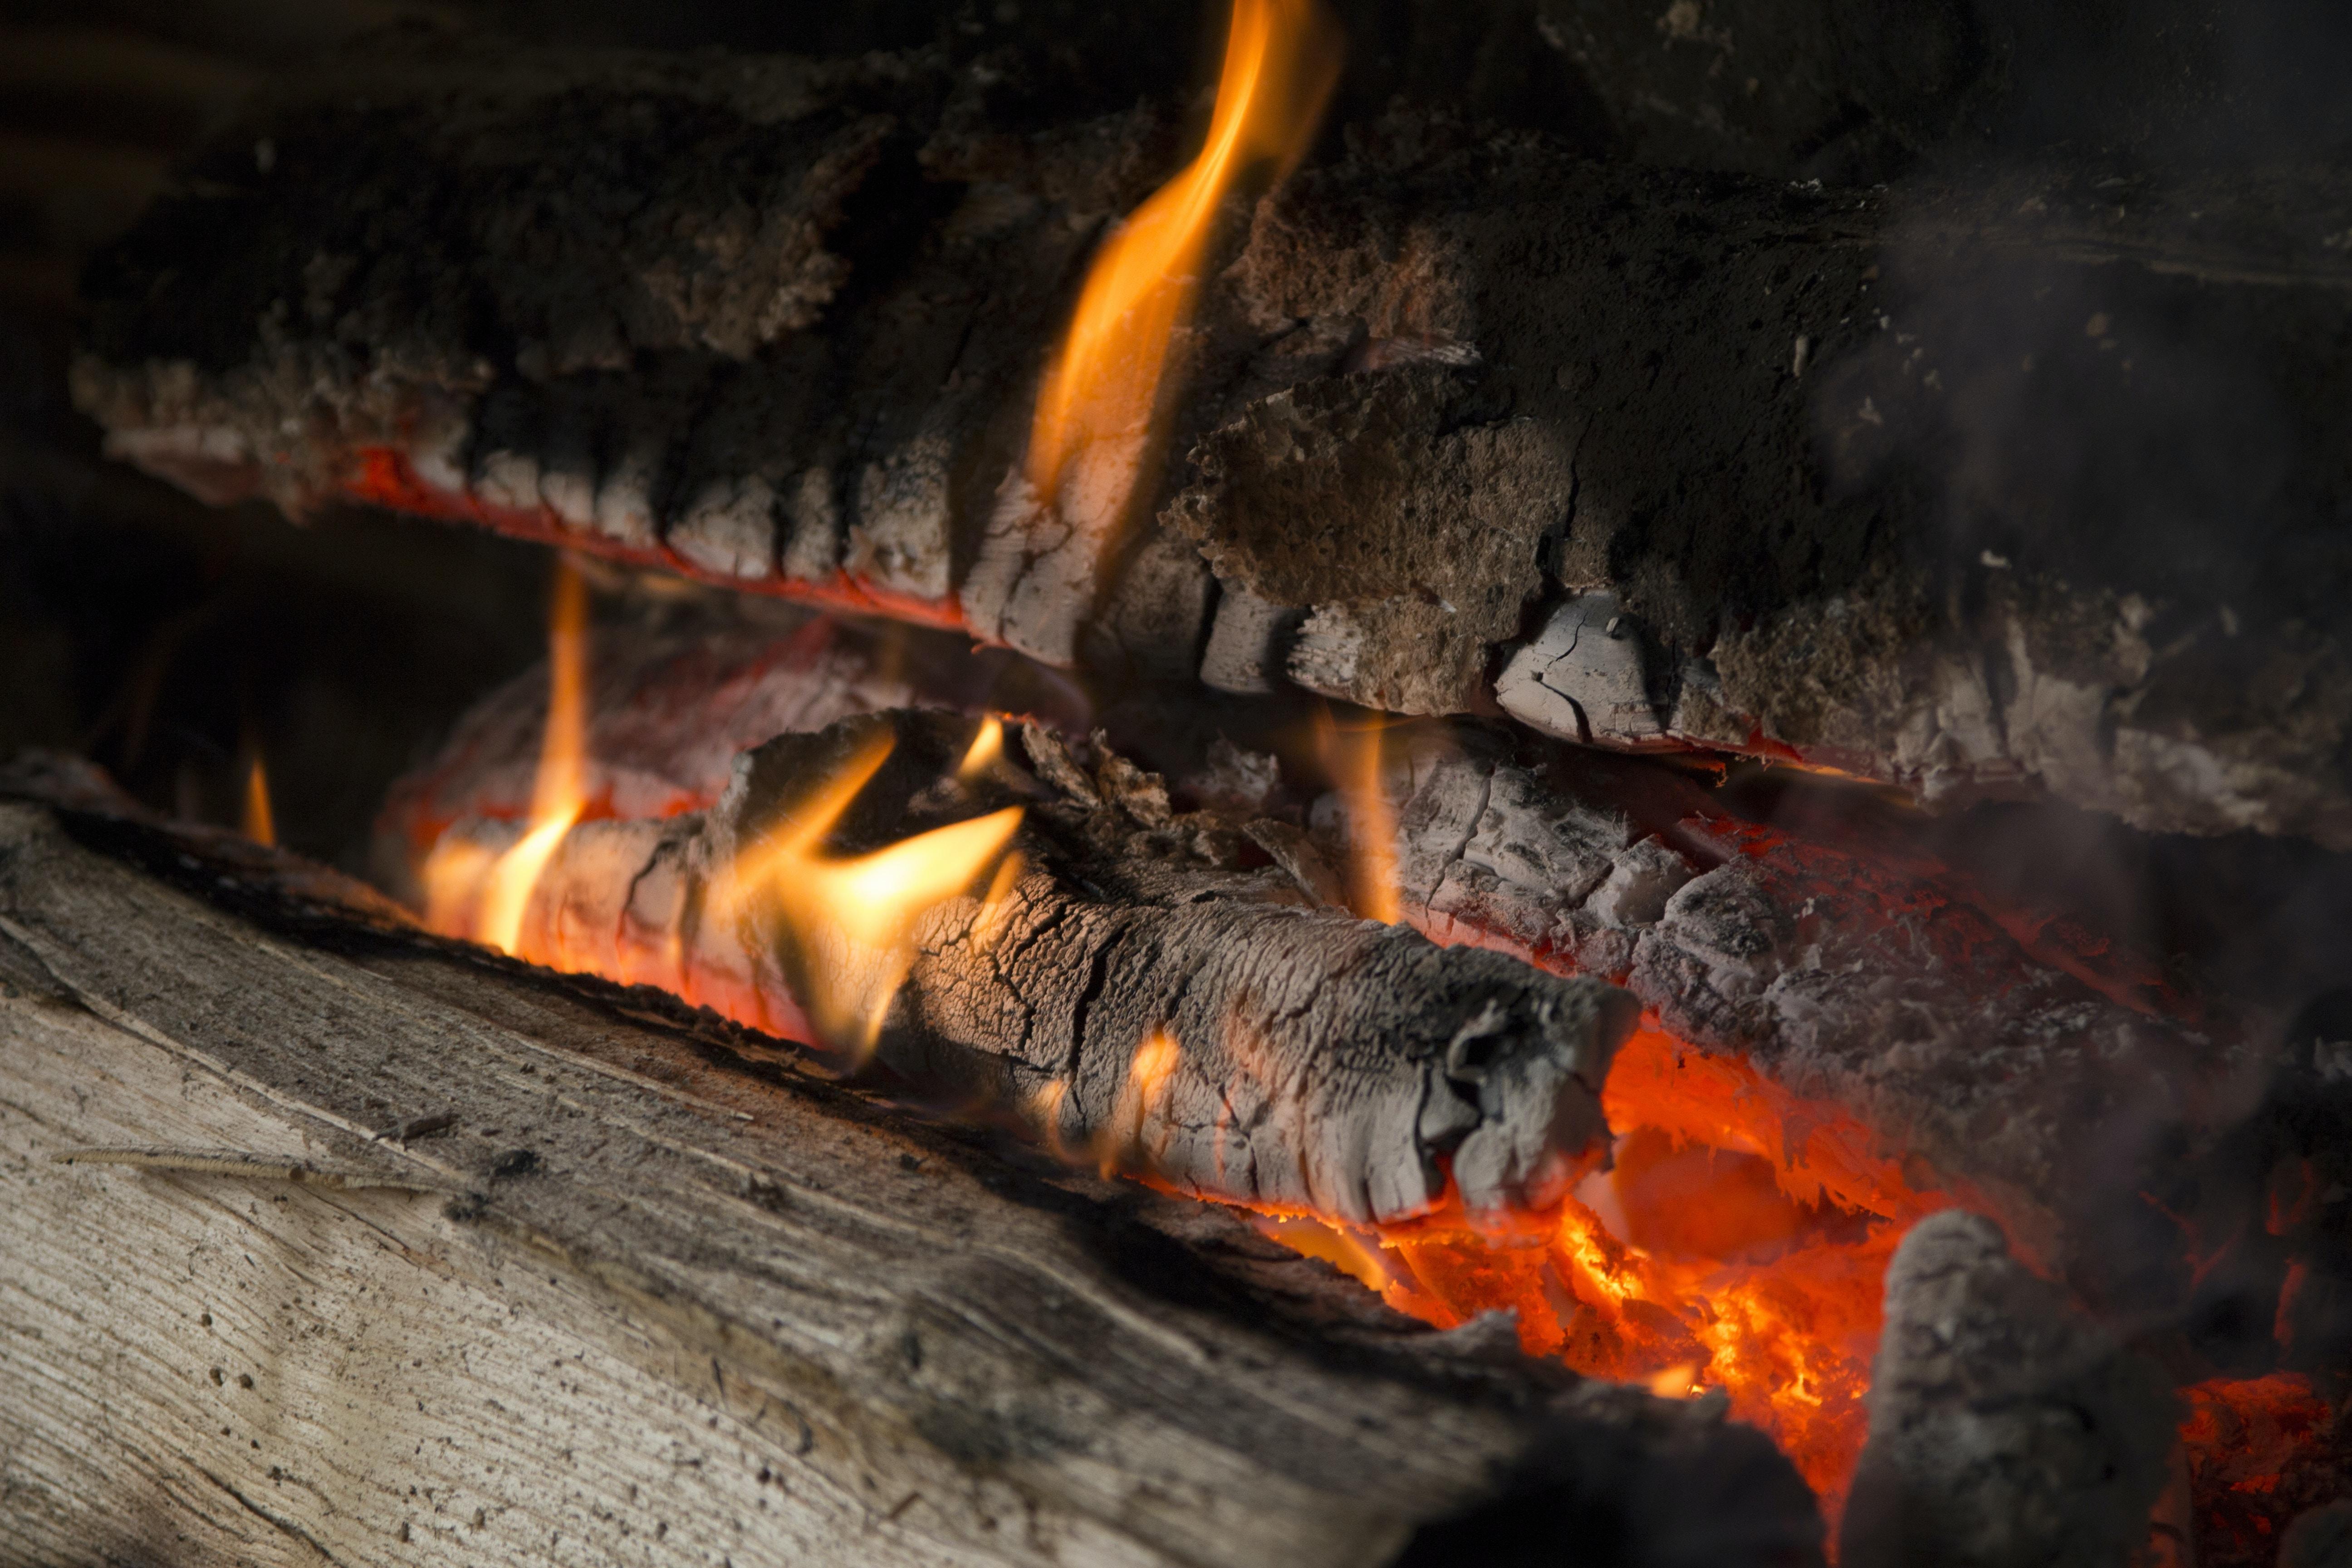 lit-up firewoods